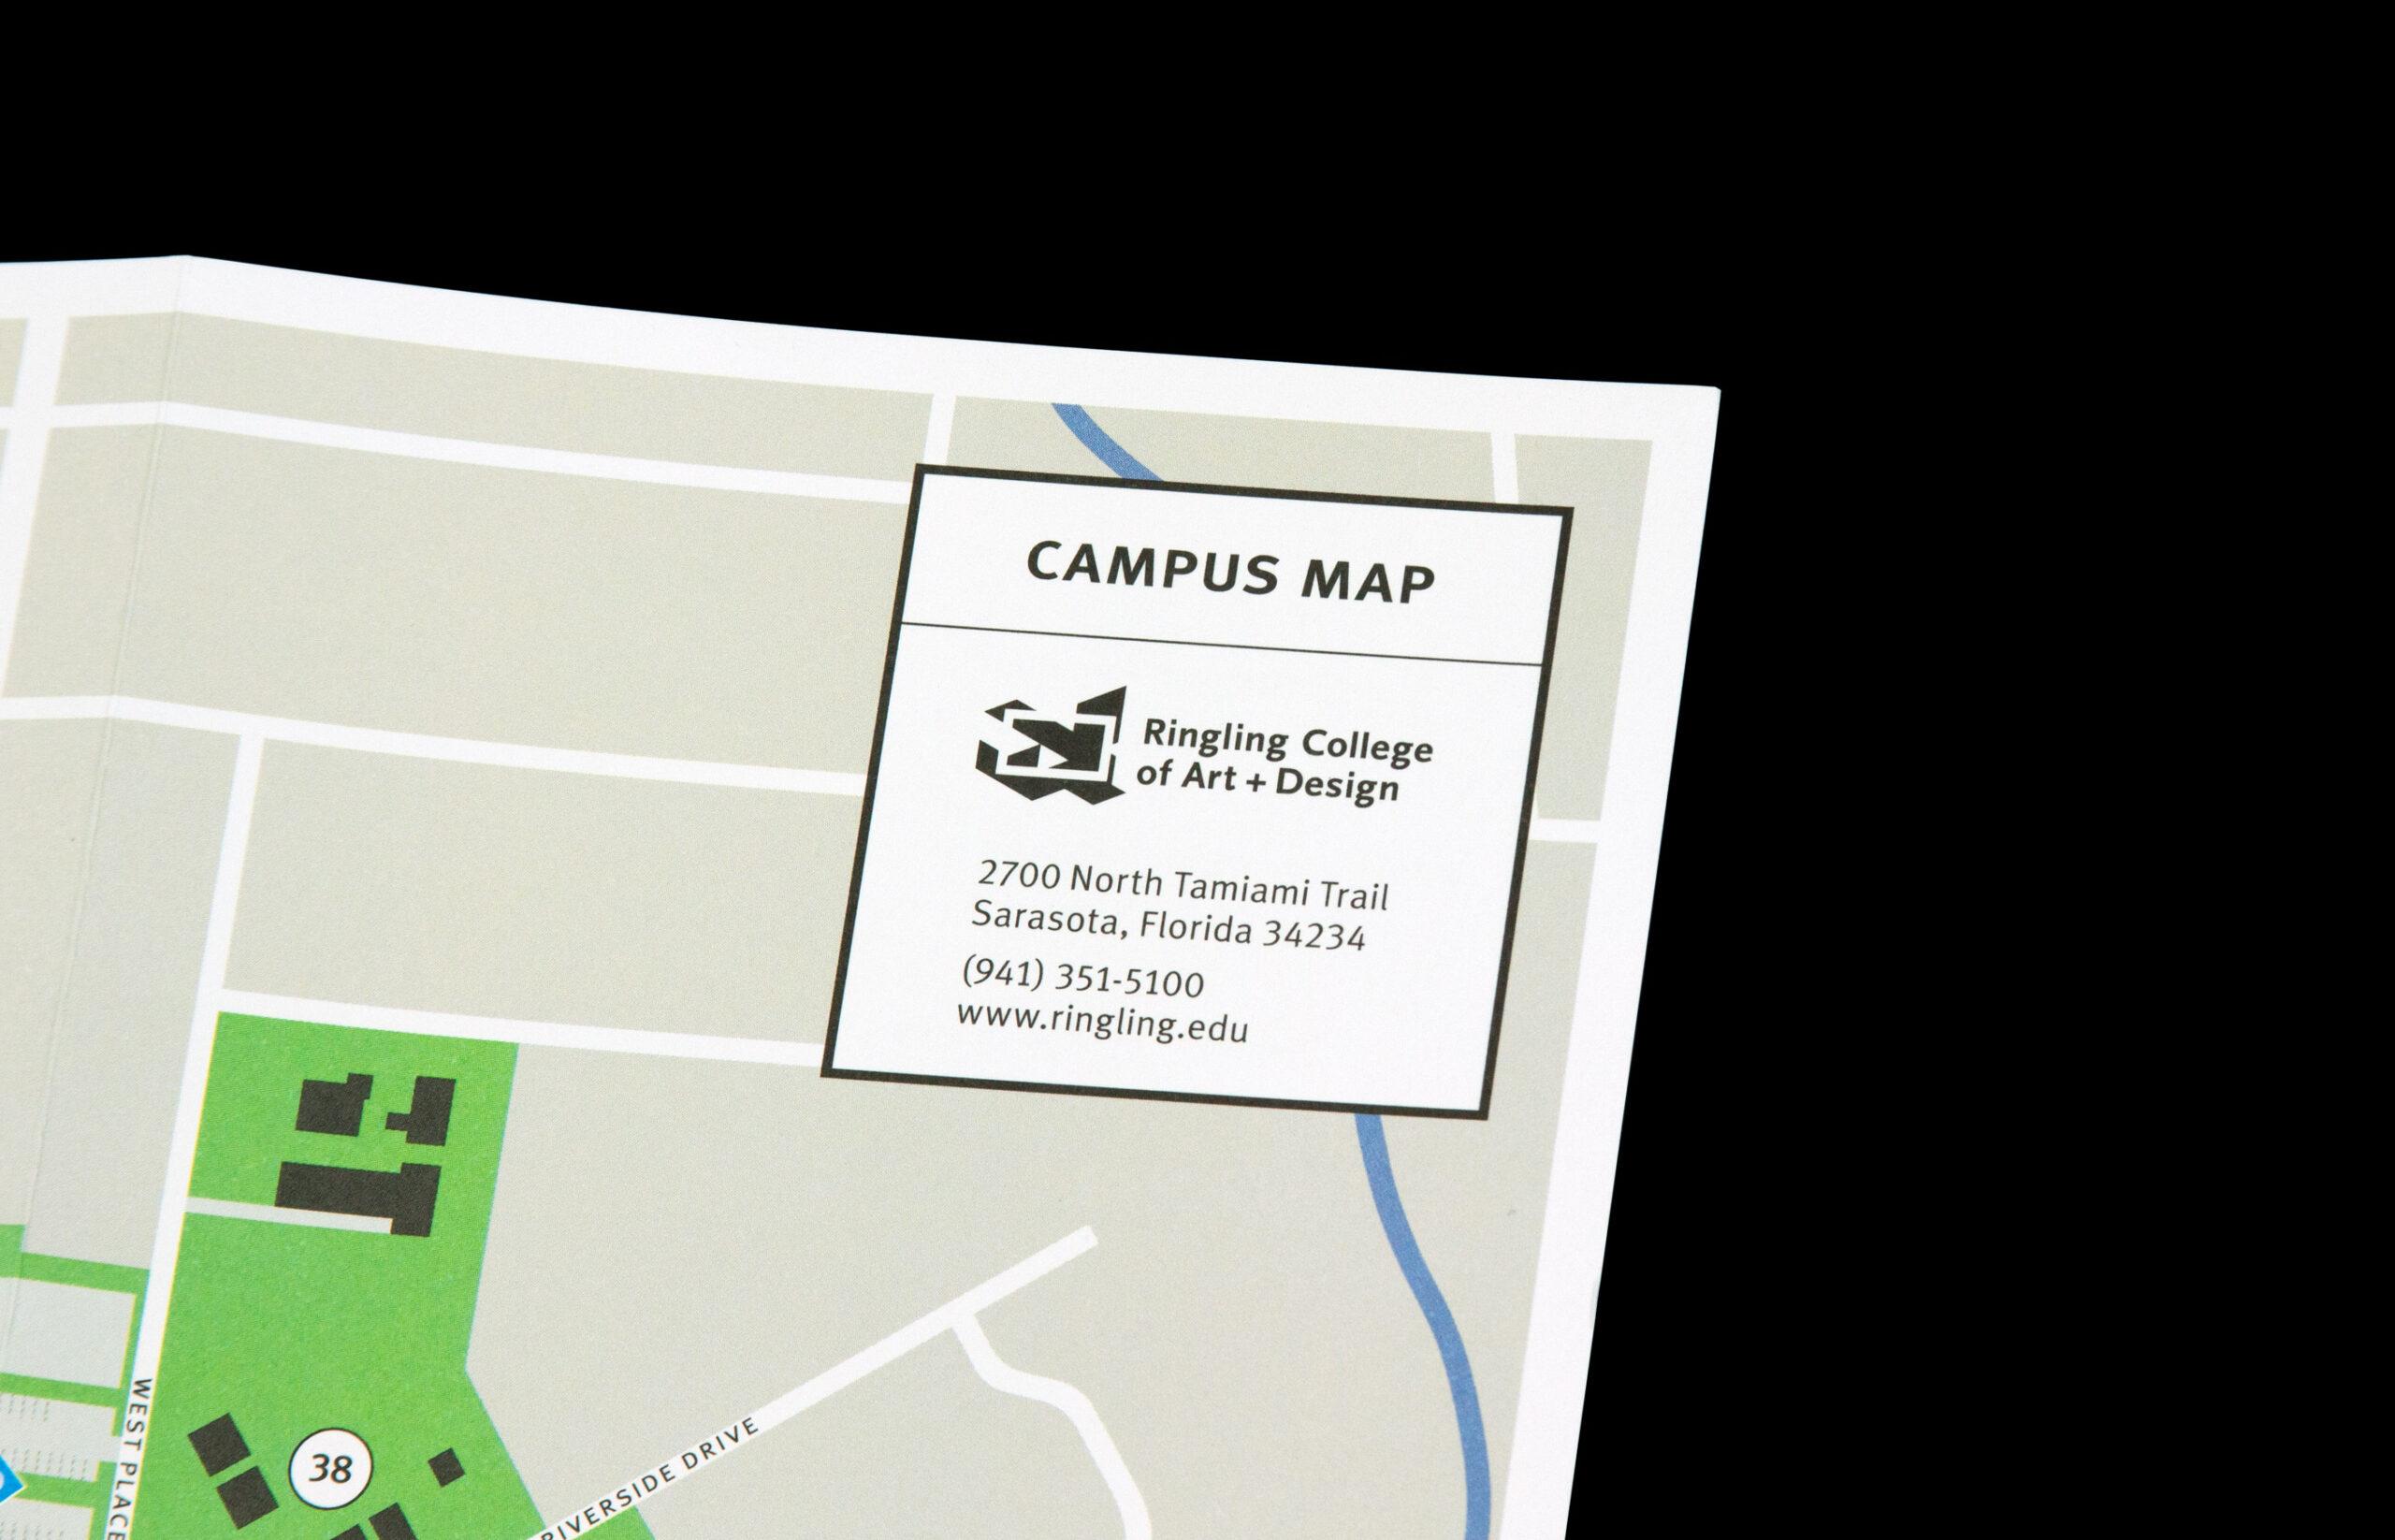 RCAD_Map_Kiosk_Detail_02